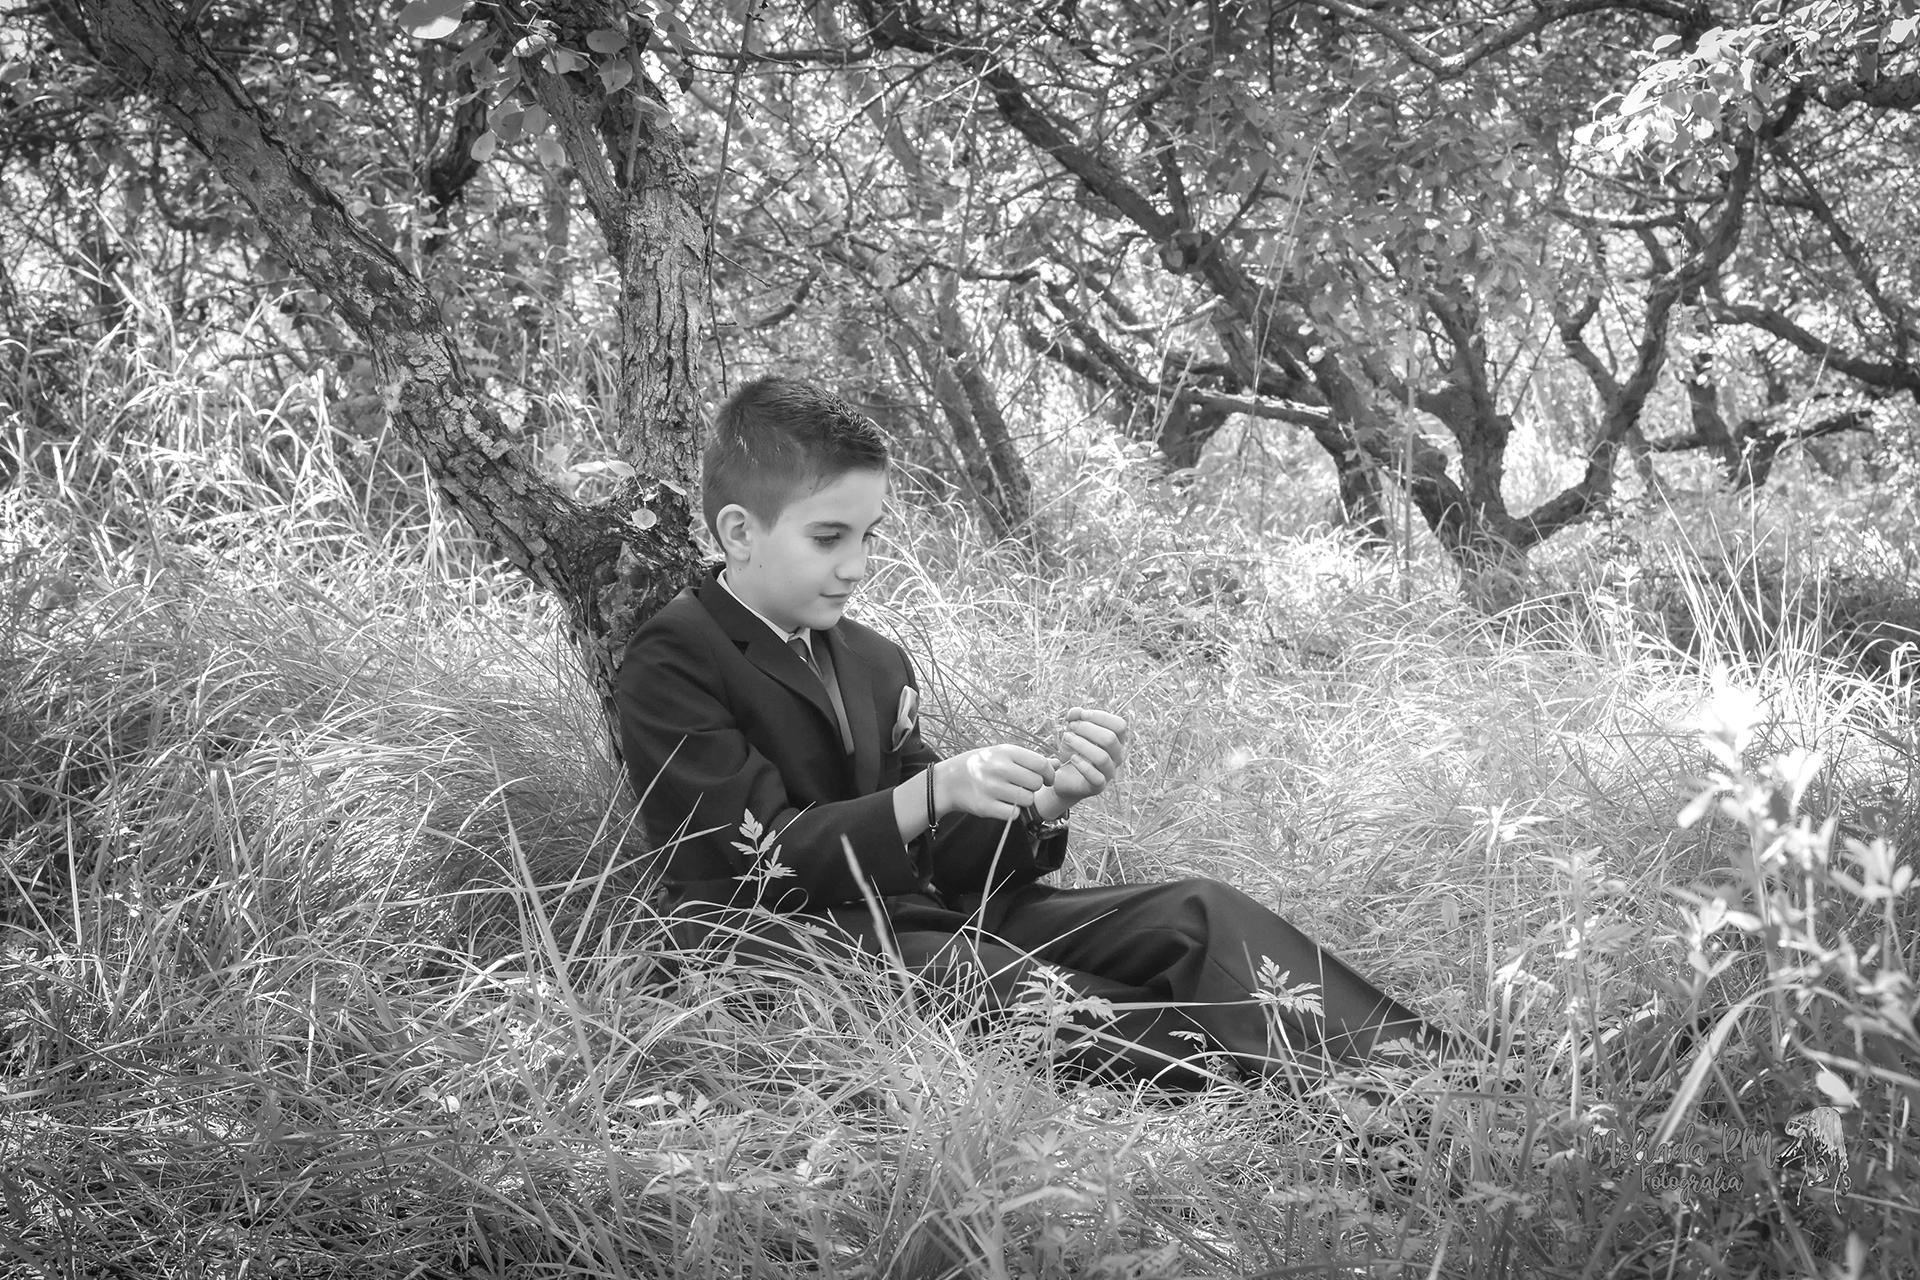 Reportaje de niño de Comunión   Raul 1